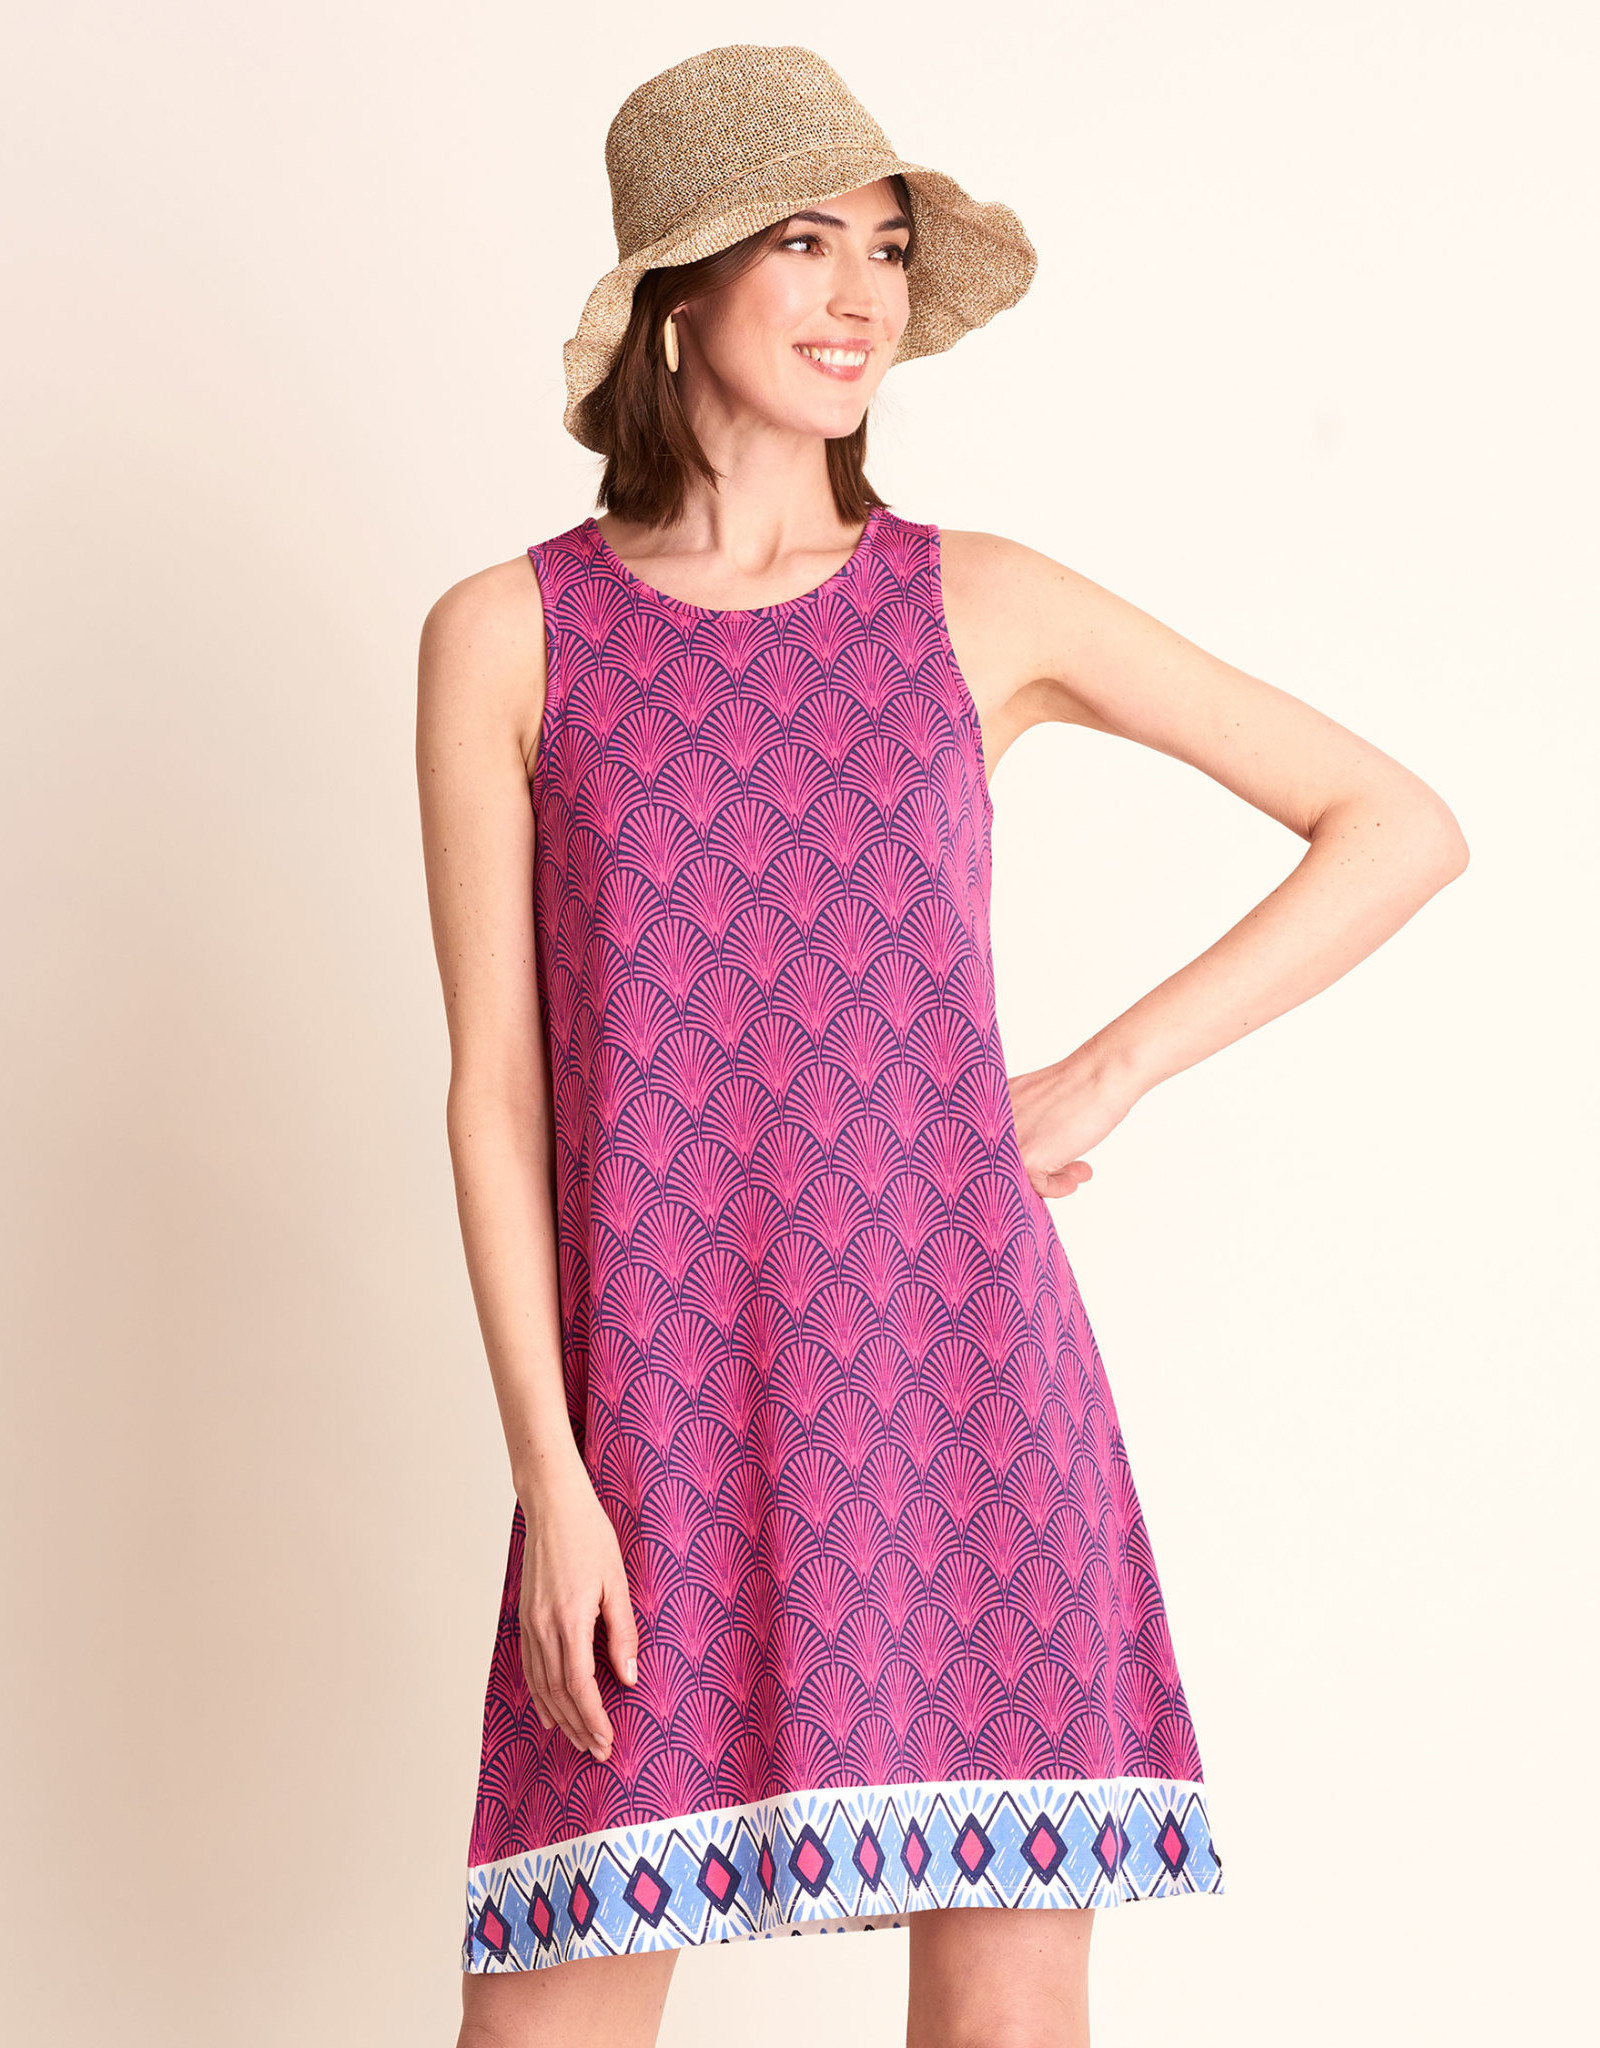 HATLEY BELLA TANK DRESS